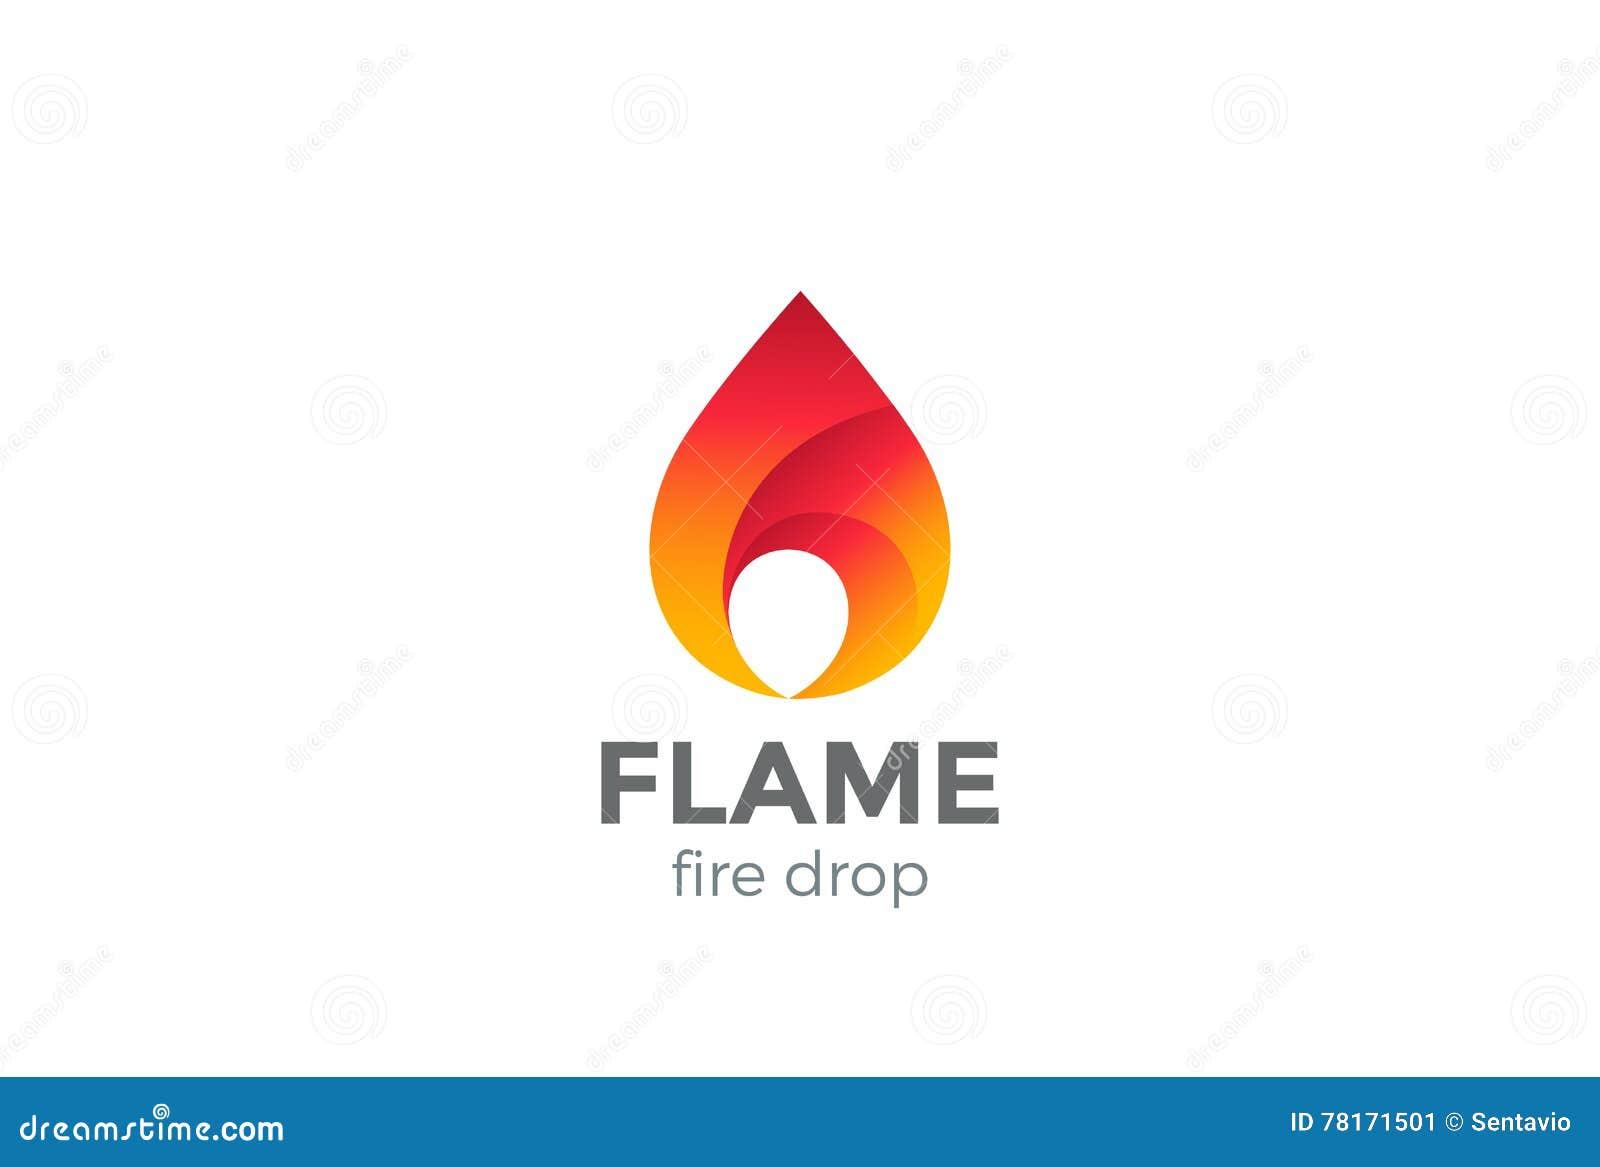 Fire Flame Logo Design Vector Droplet  Red Drop Stock Vector